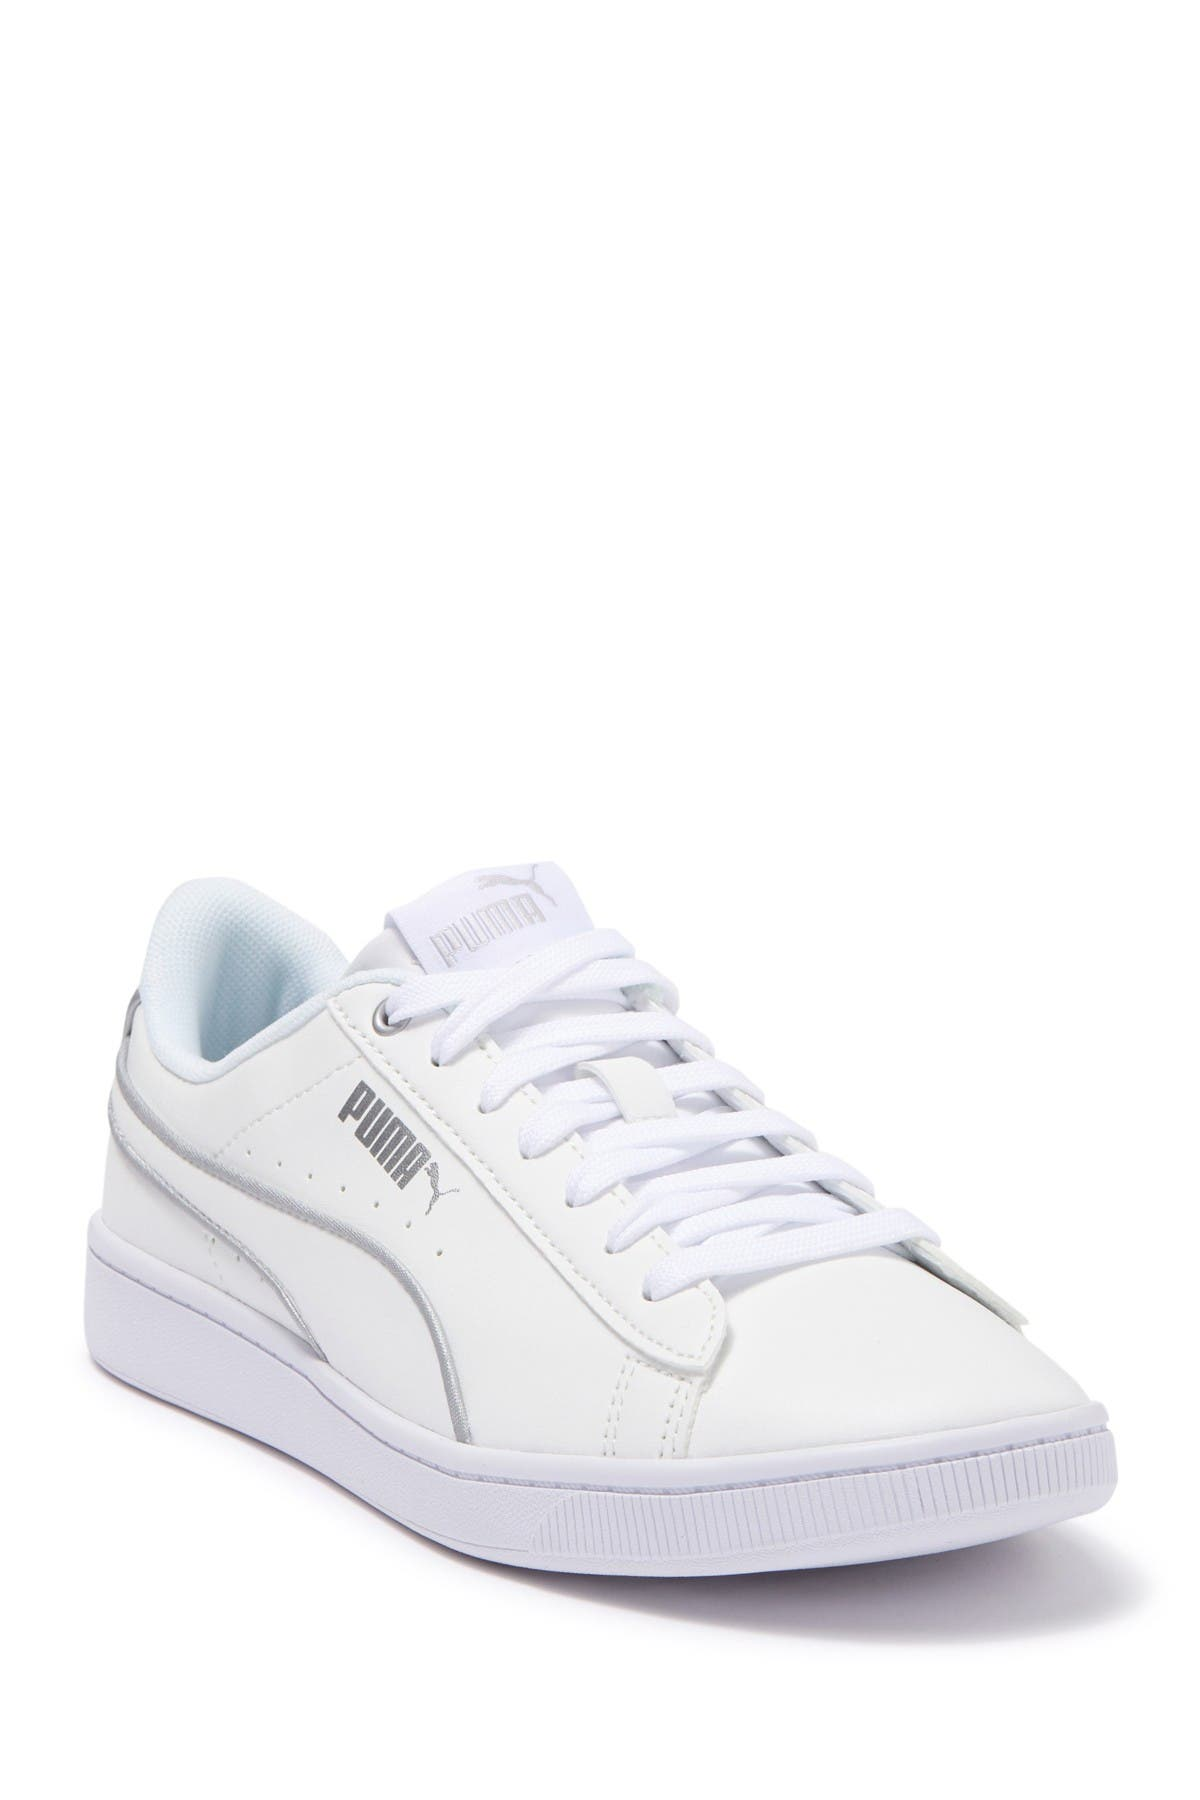 Image of PUMA Vikky V2 Hem Sneaker